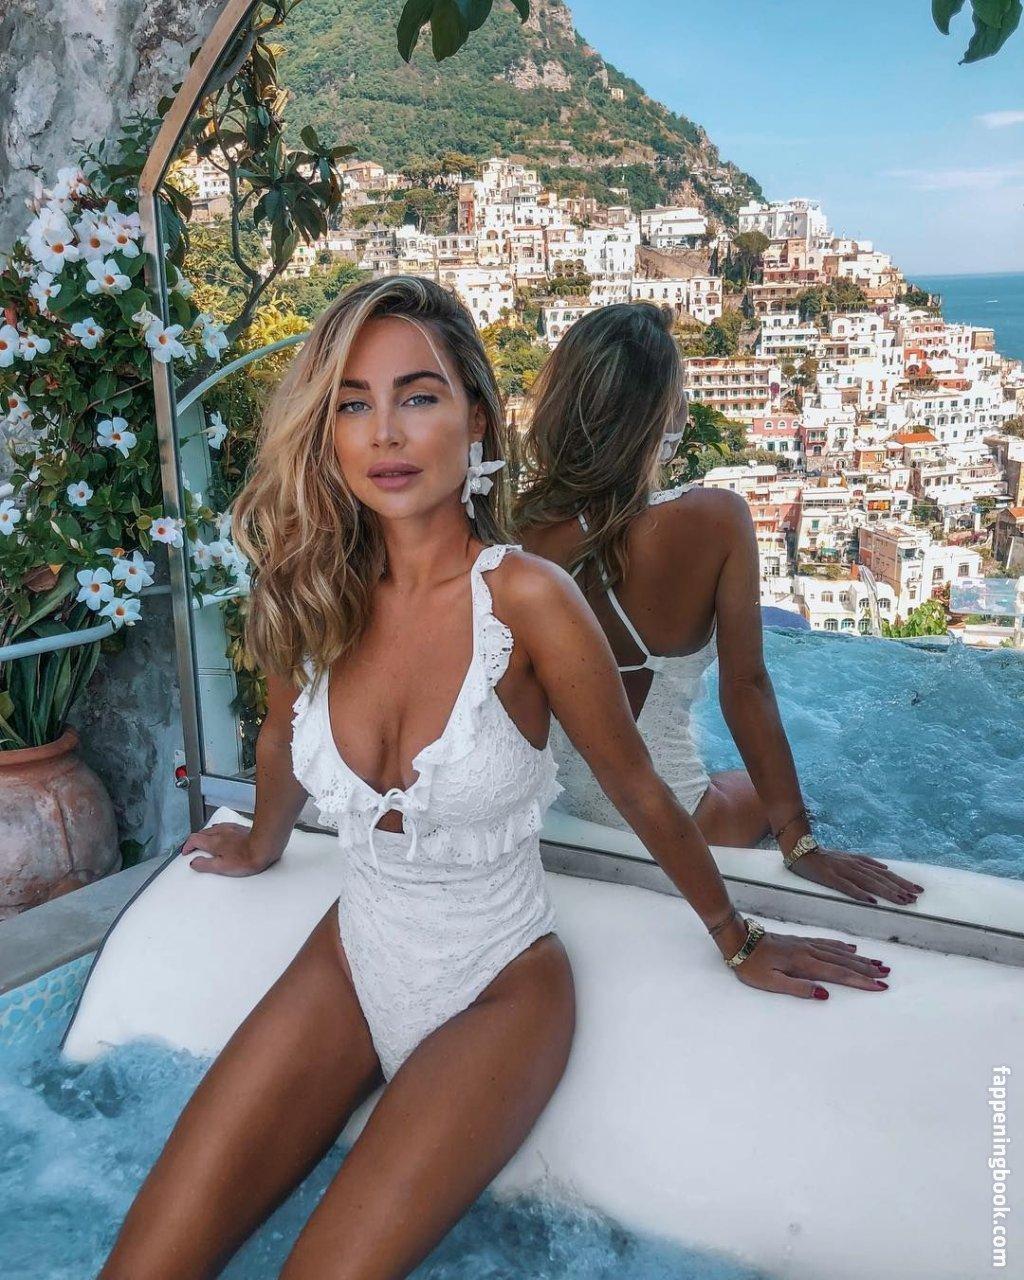 Angela Kerecz Porn johanna emma olsson nude, sexy, the fappening, uncensored